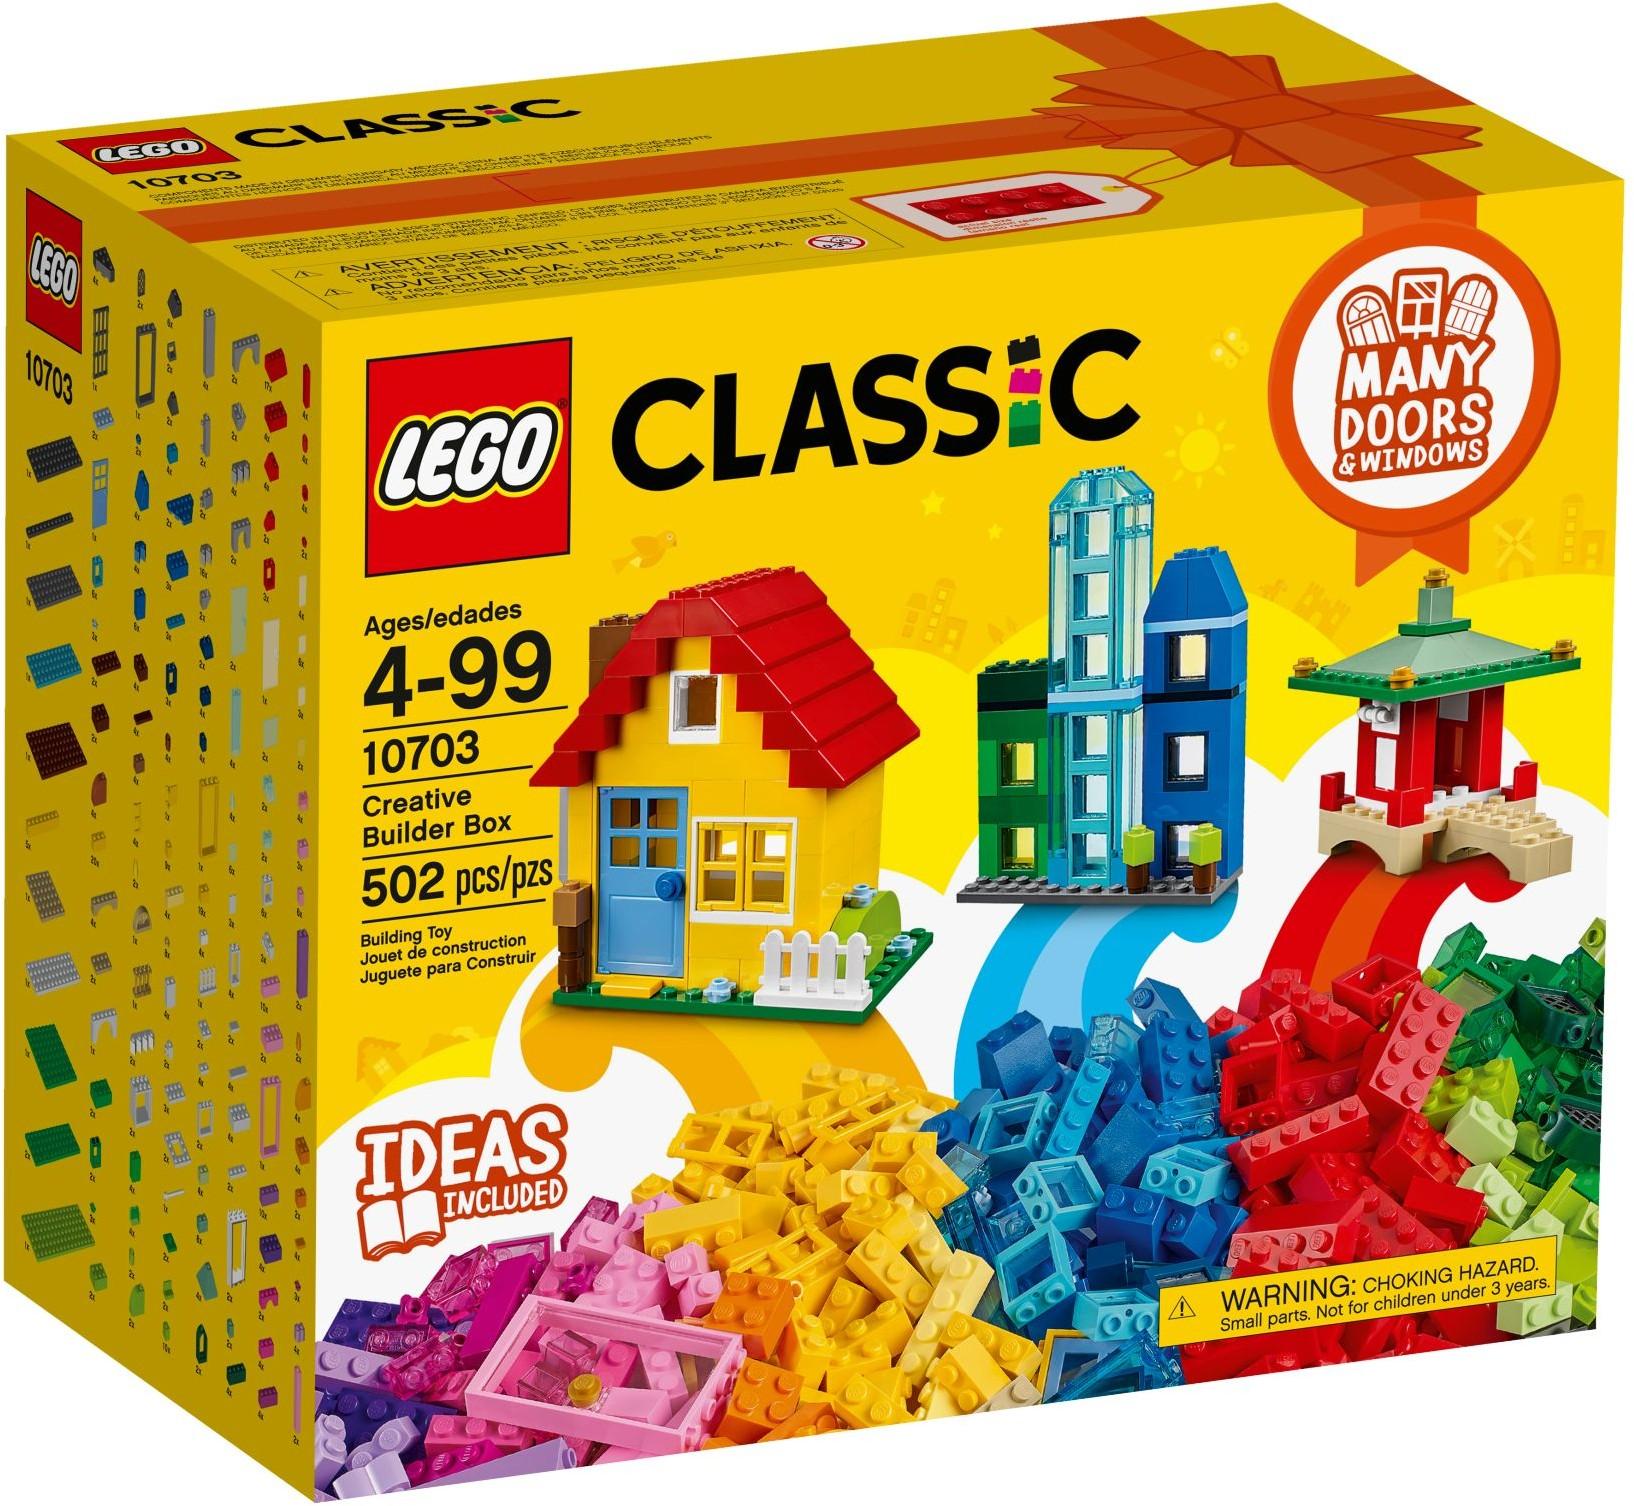 Photo Frame Ideas 10703 Lego Classic Creative Builder Box